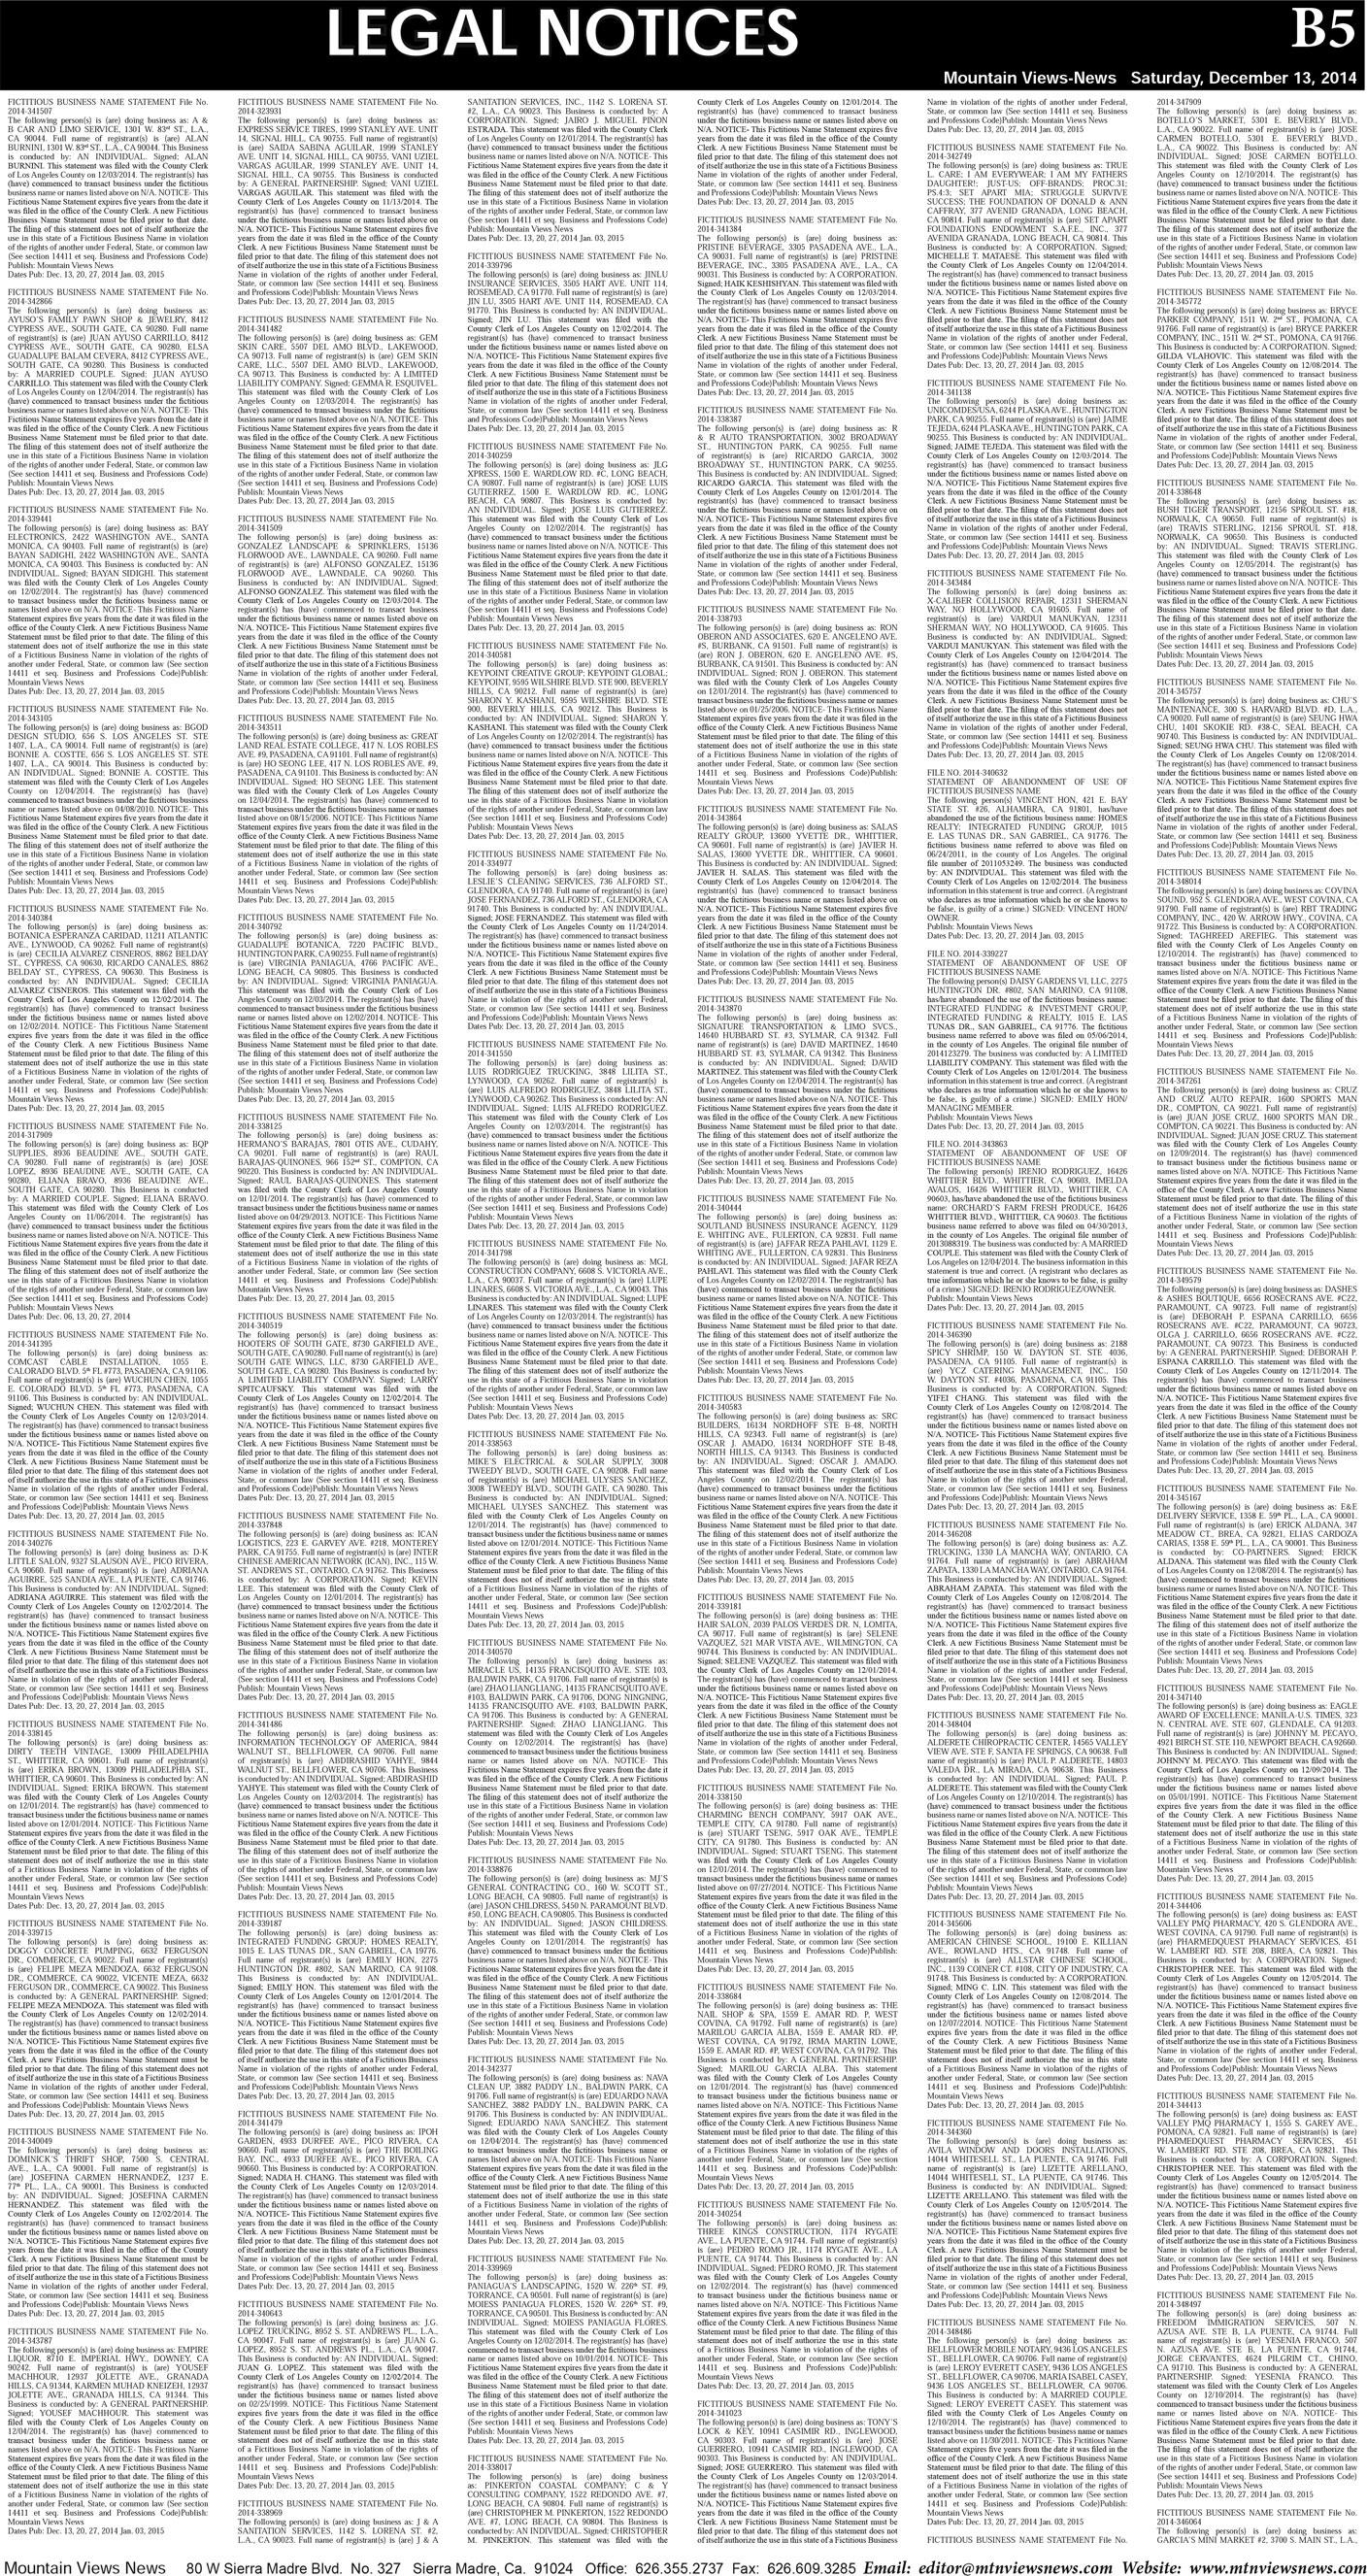 pB:5, v8.50 — Legal Notices (1) — Mountain Views News